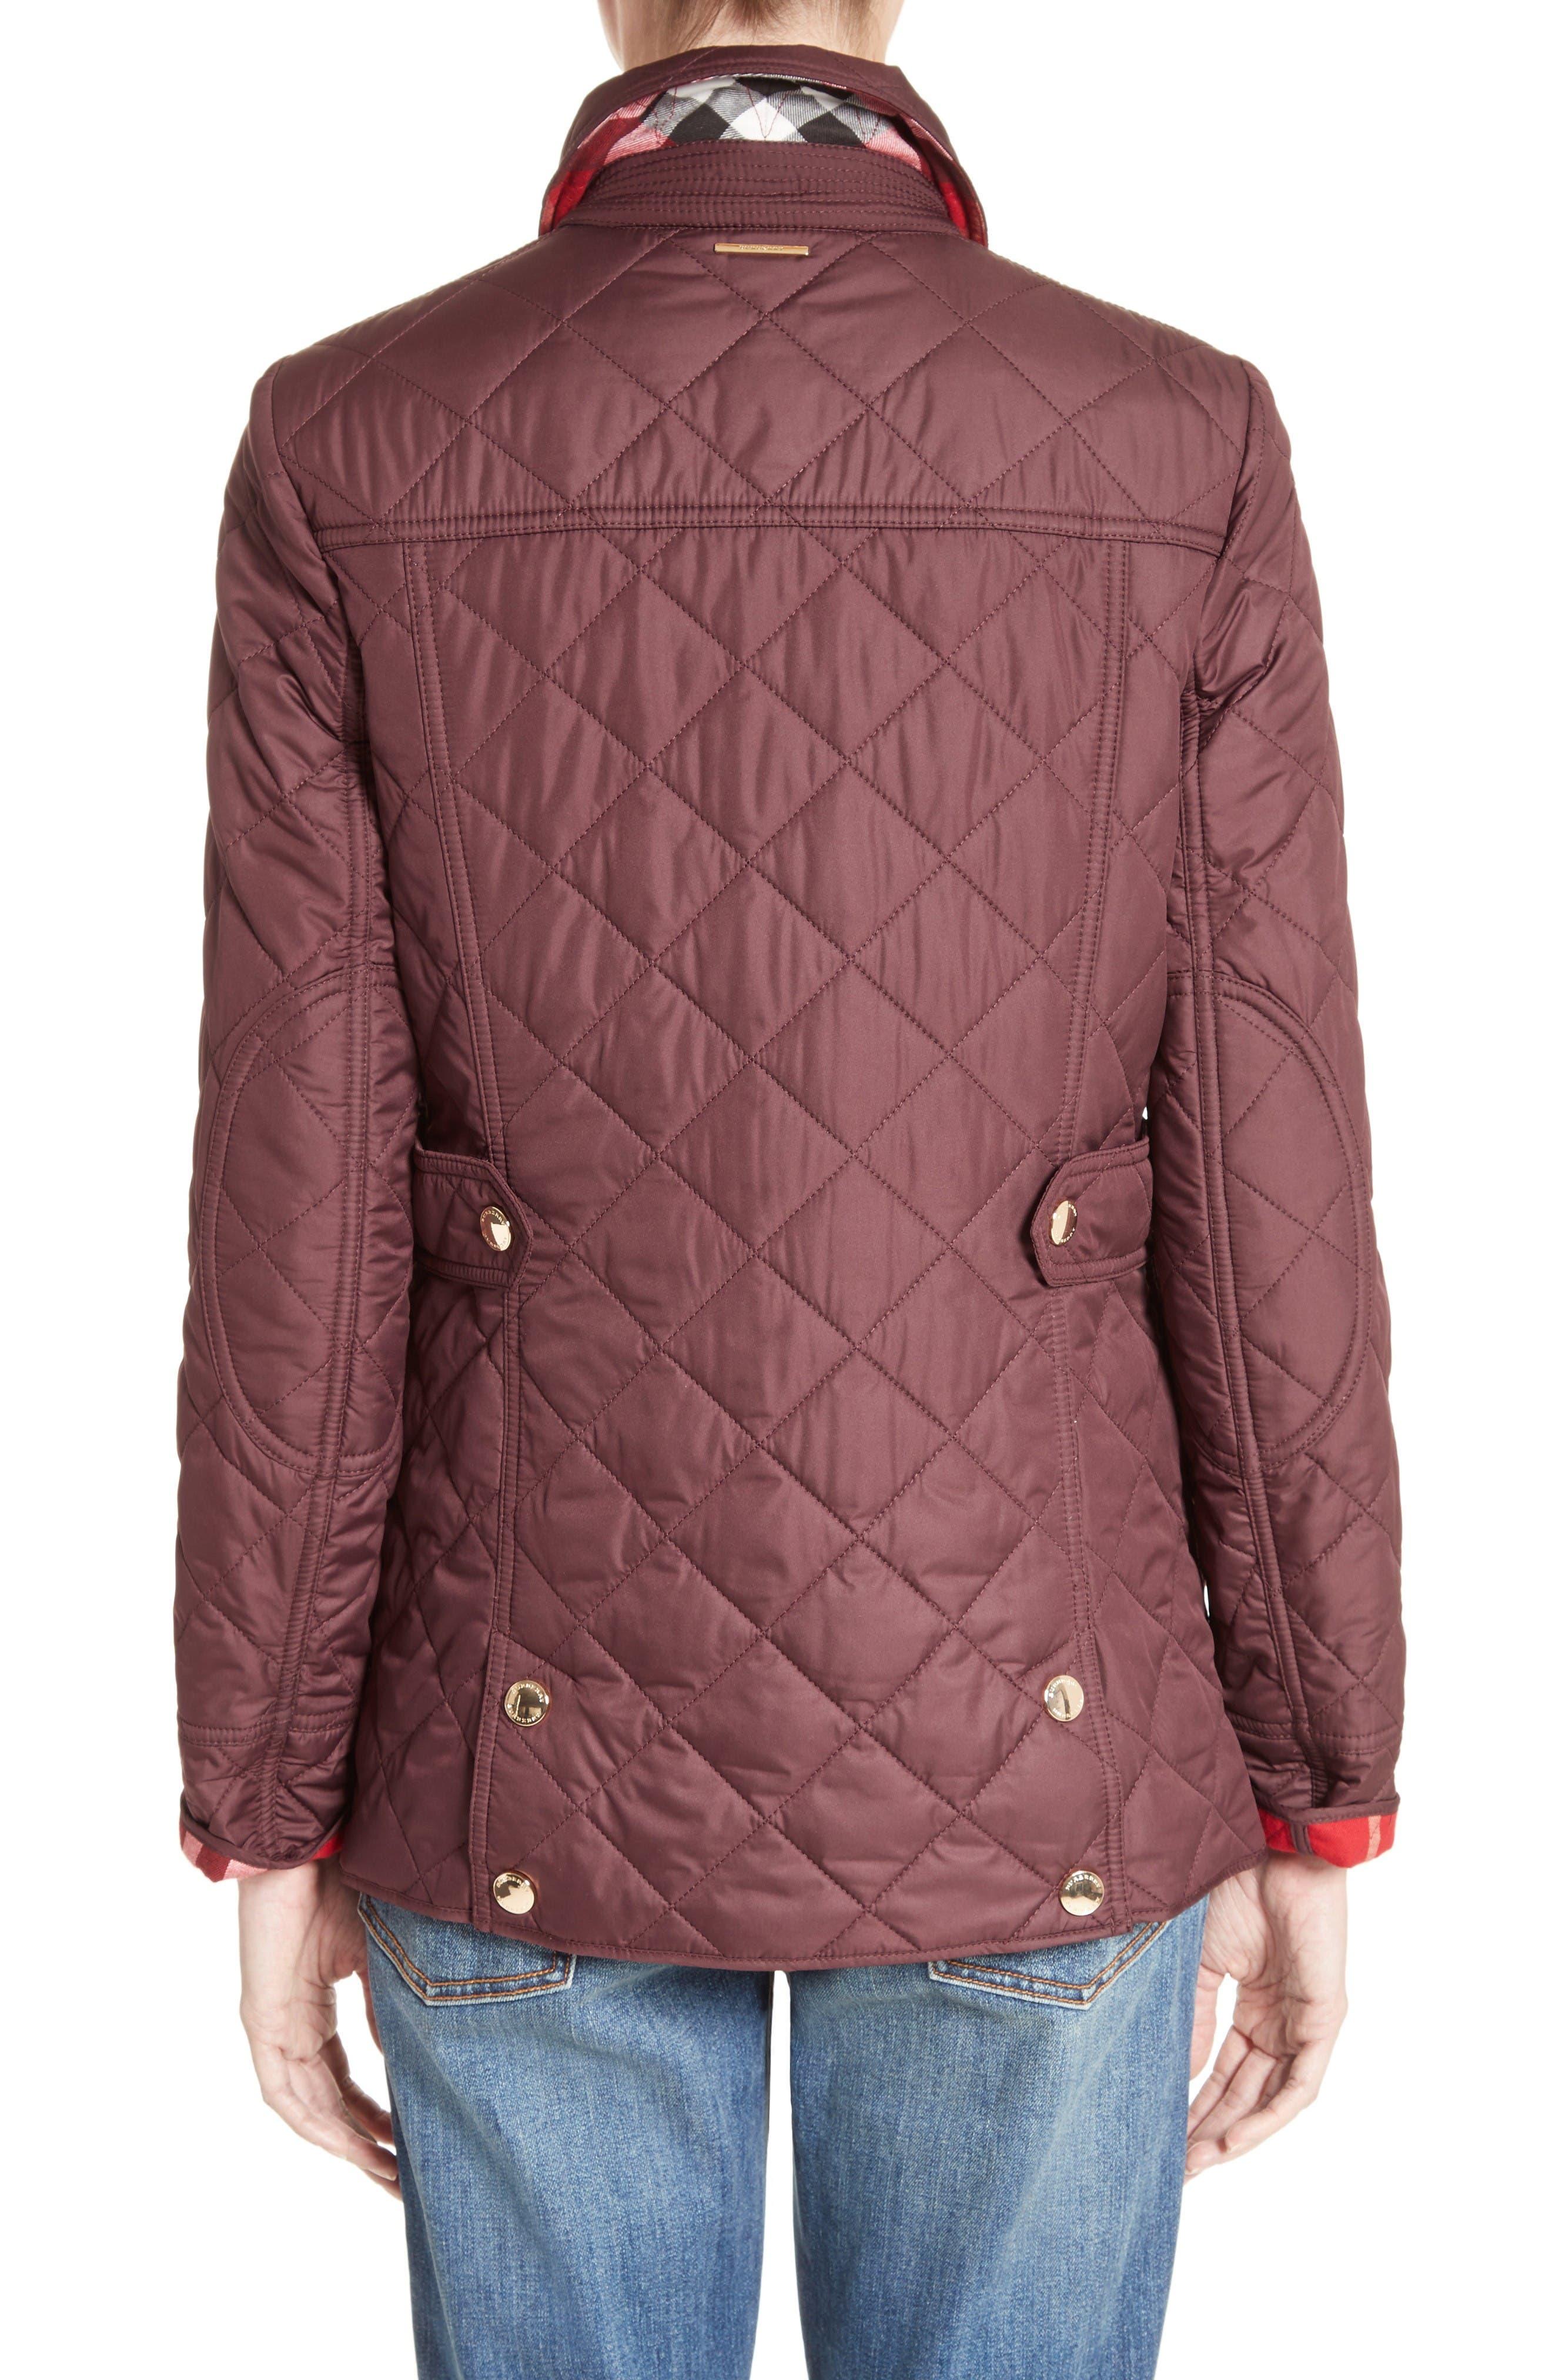 Westbridge Quilted Jacket,                             Alternate thumbnail 2, color,                             Burgundy